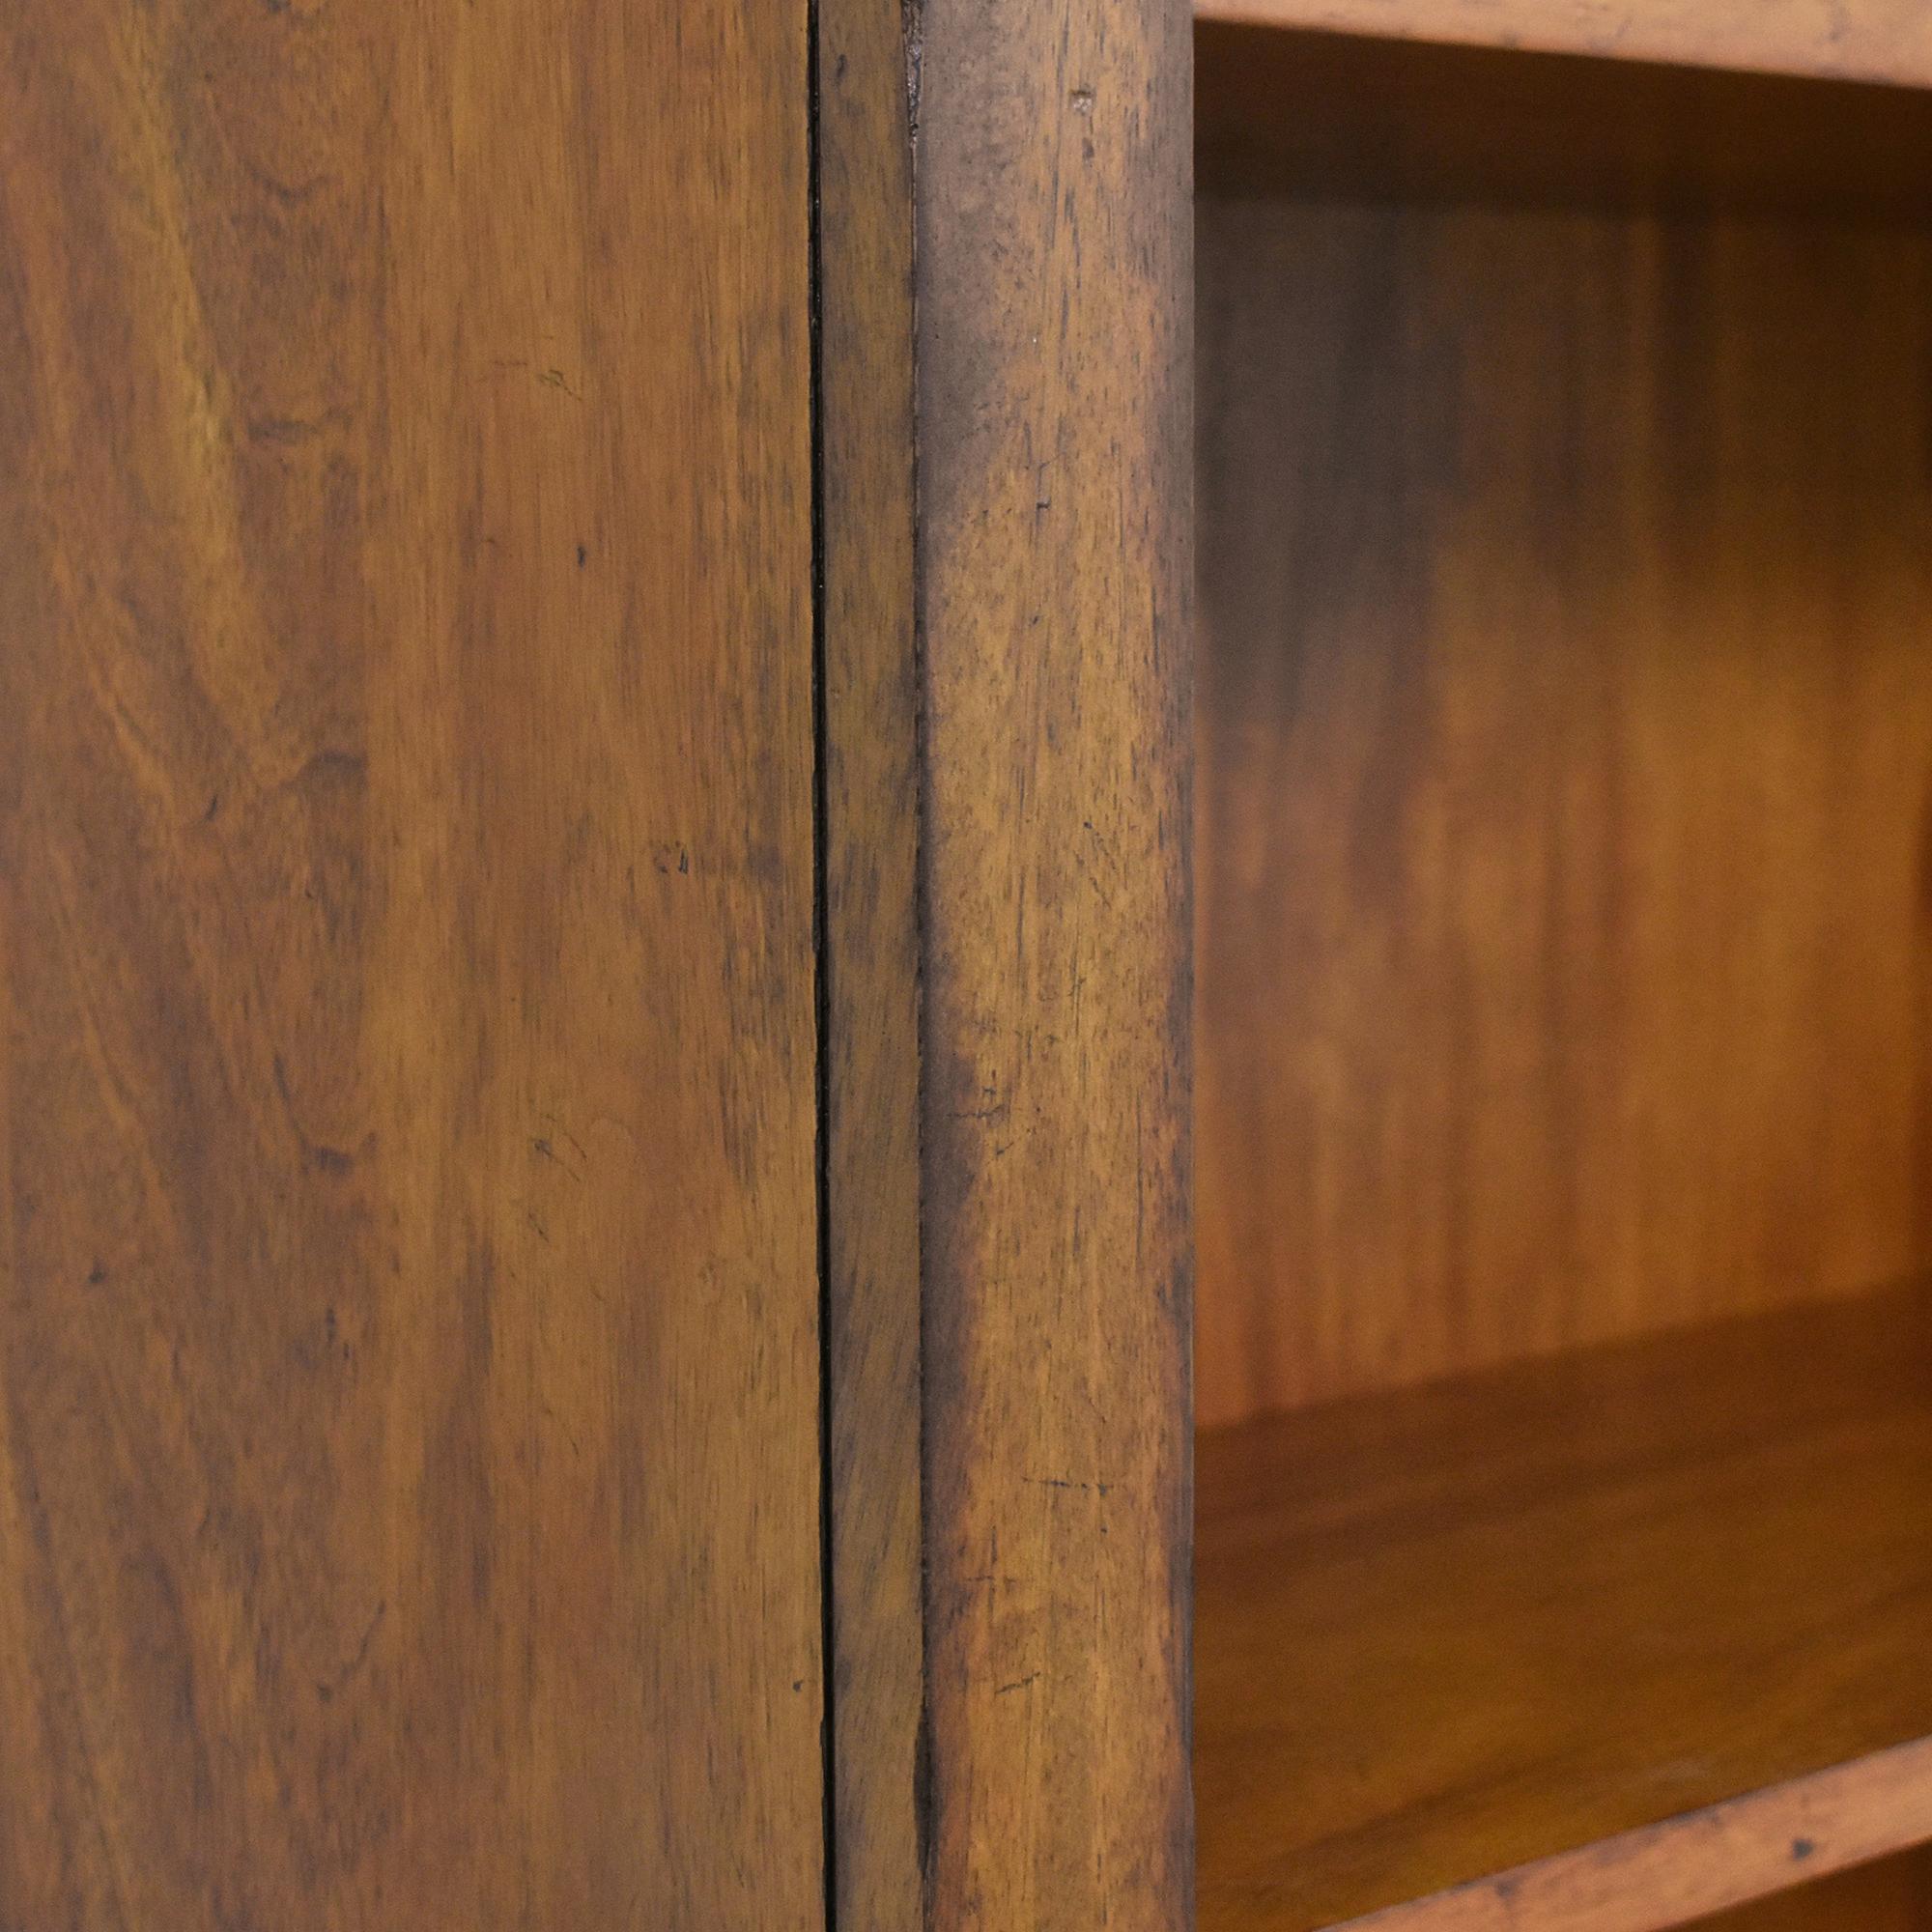 Ethan Allen Ethan Allen Tall Bookcase for sale